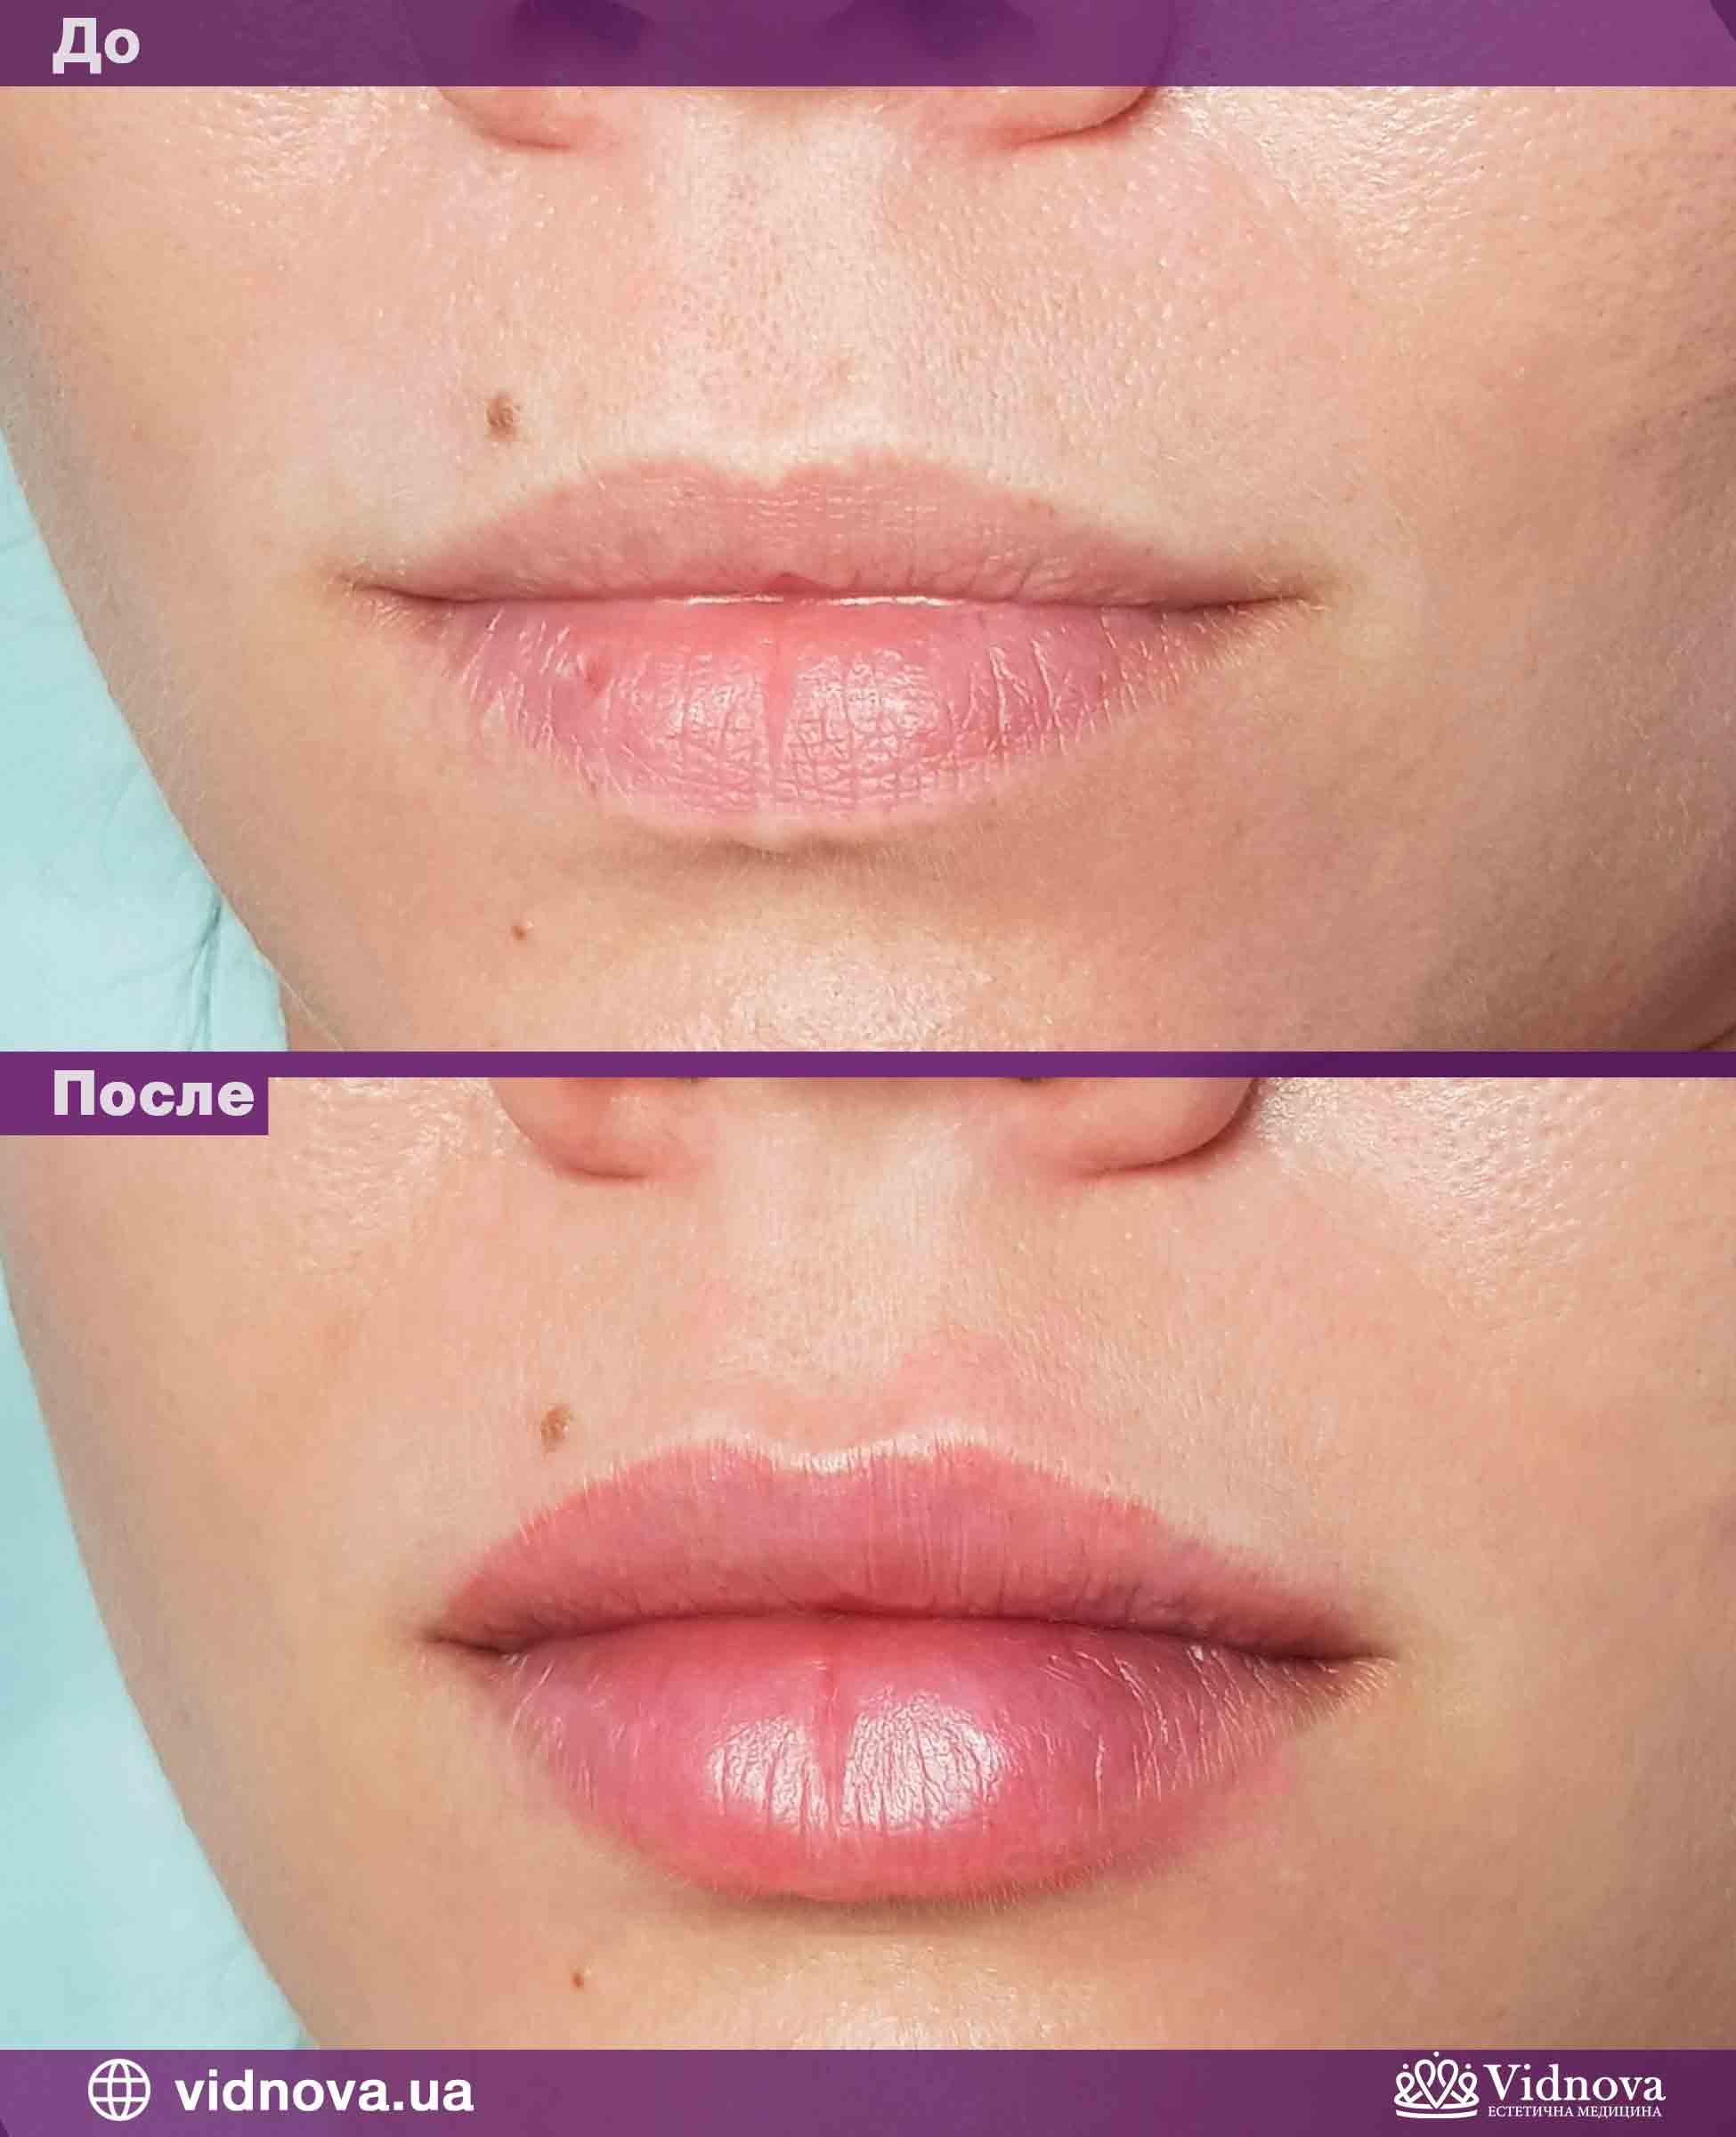 Увеличение губ: Фото До и После - Пример №1-2 - Клиника Vidnova